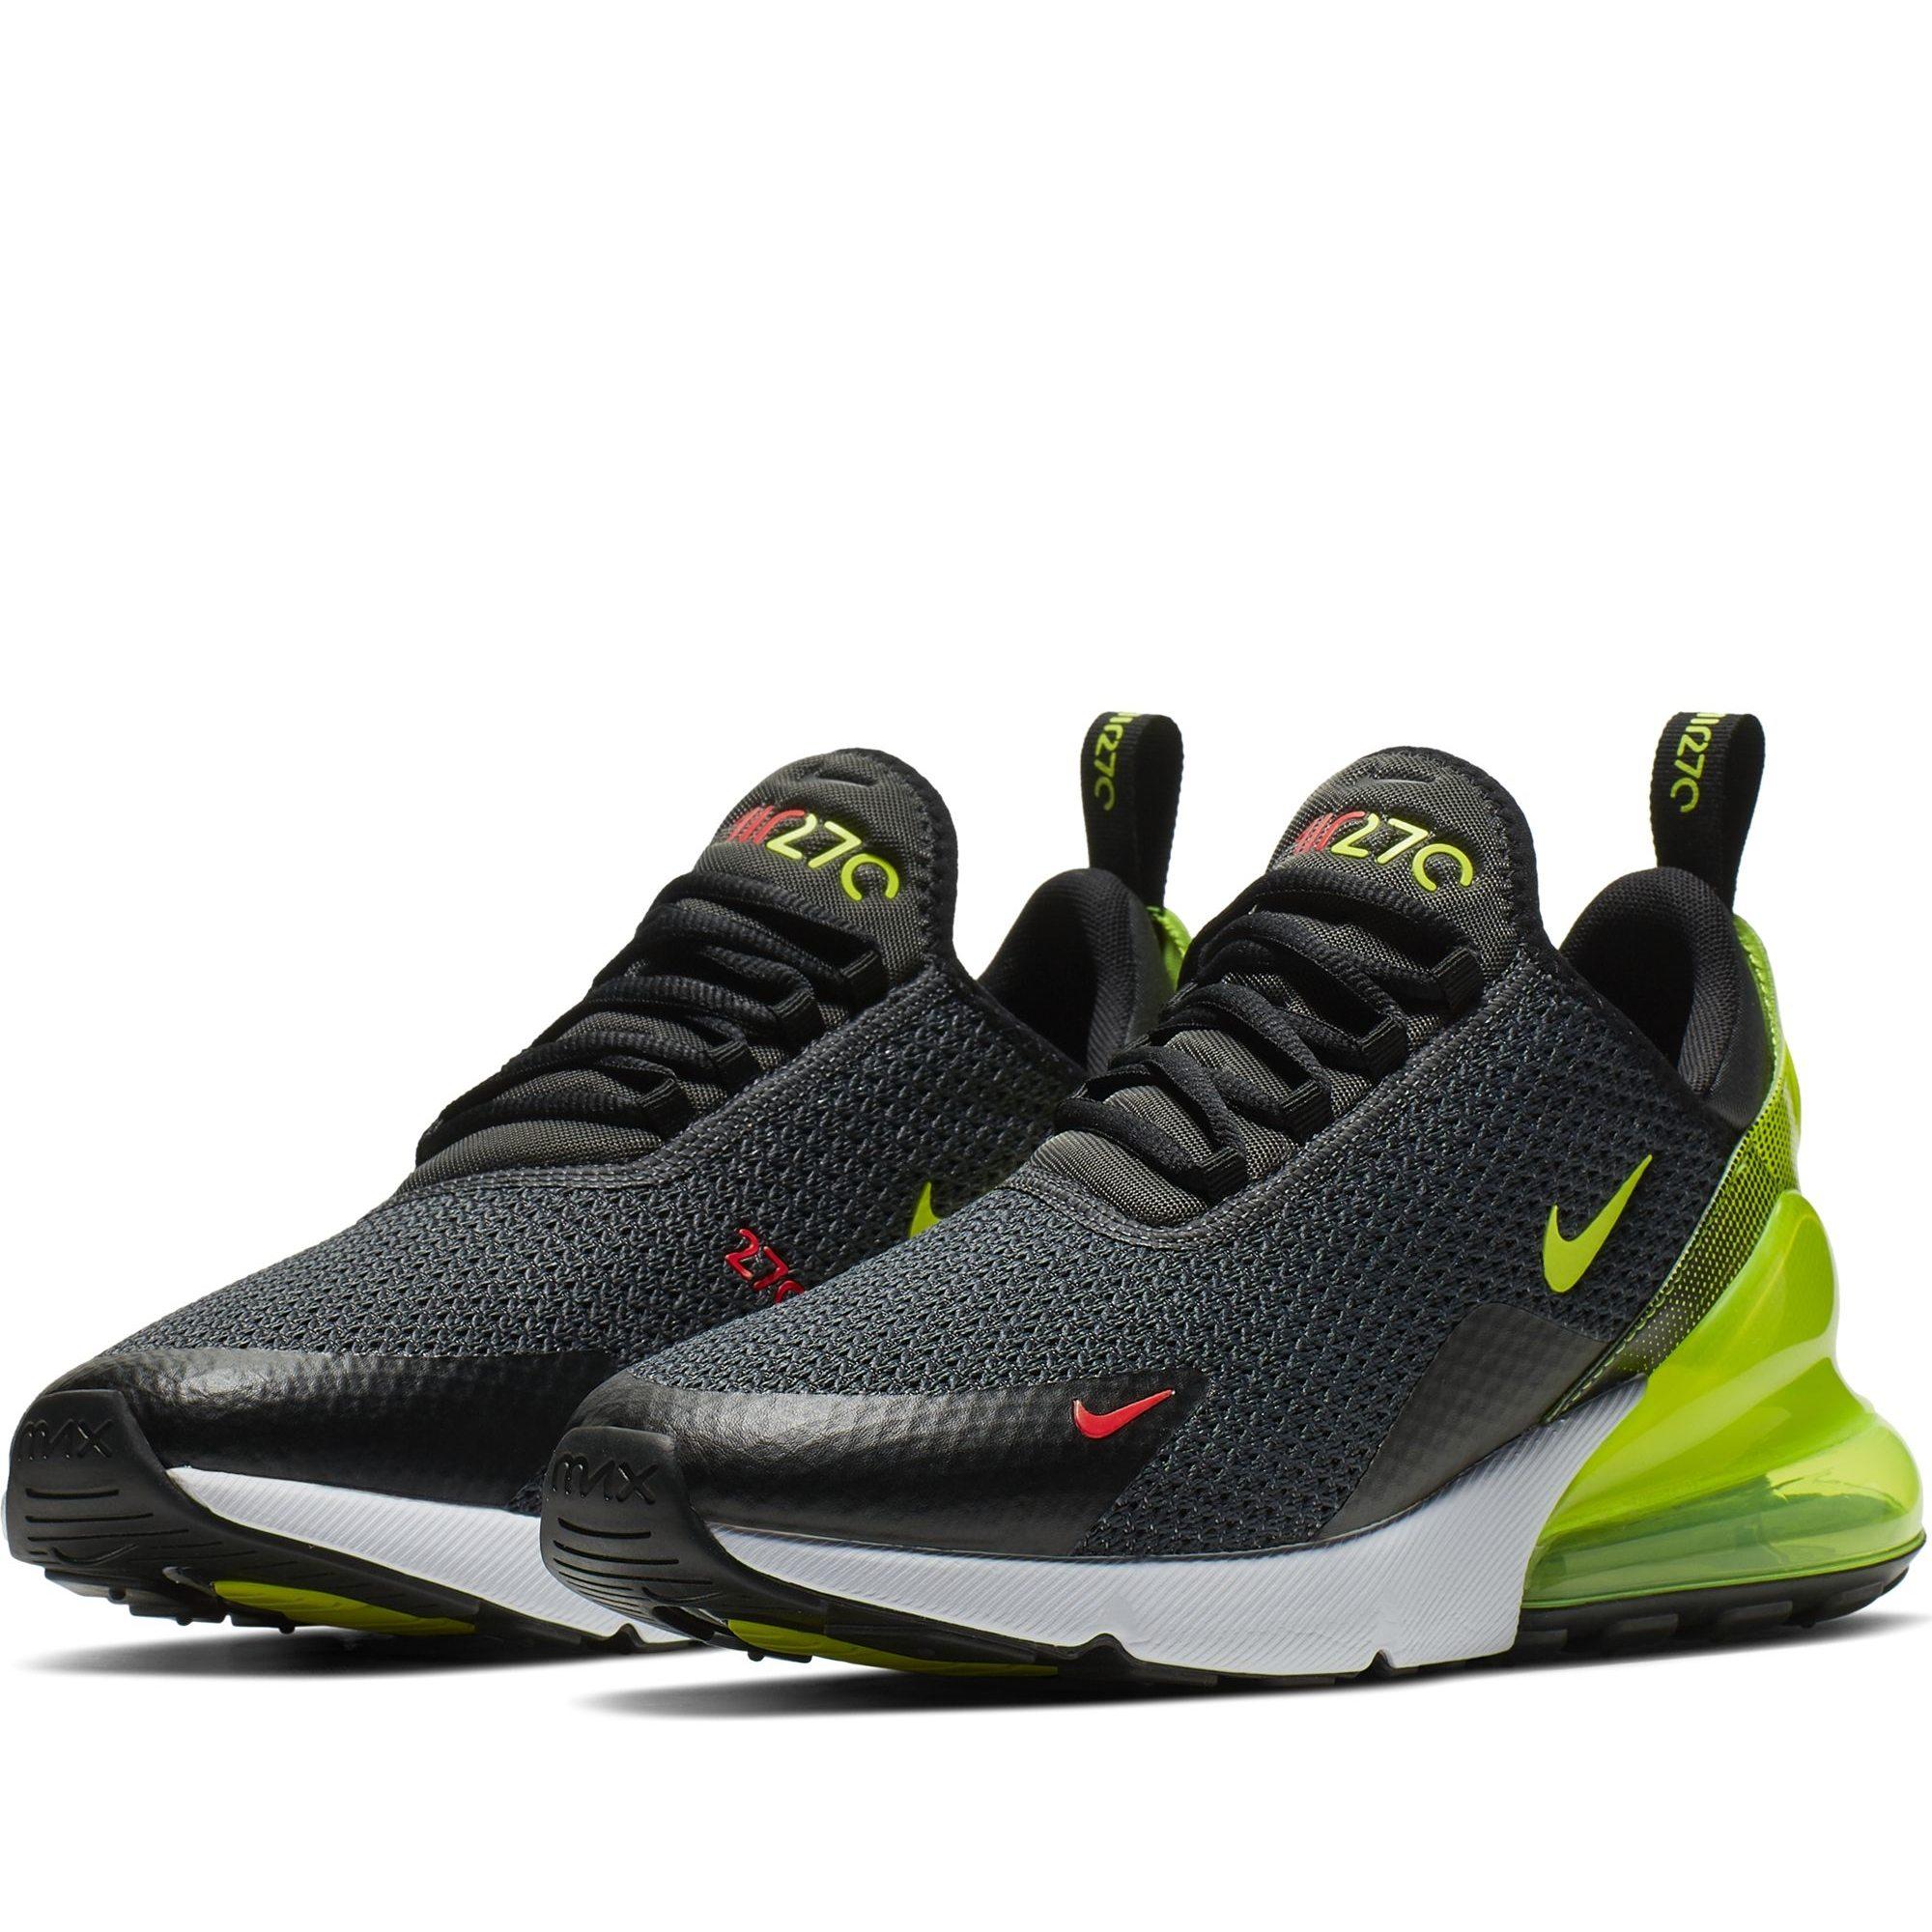 Nike Shoes Mens Air Max 270 SE Anthracite Volt Black Bright